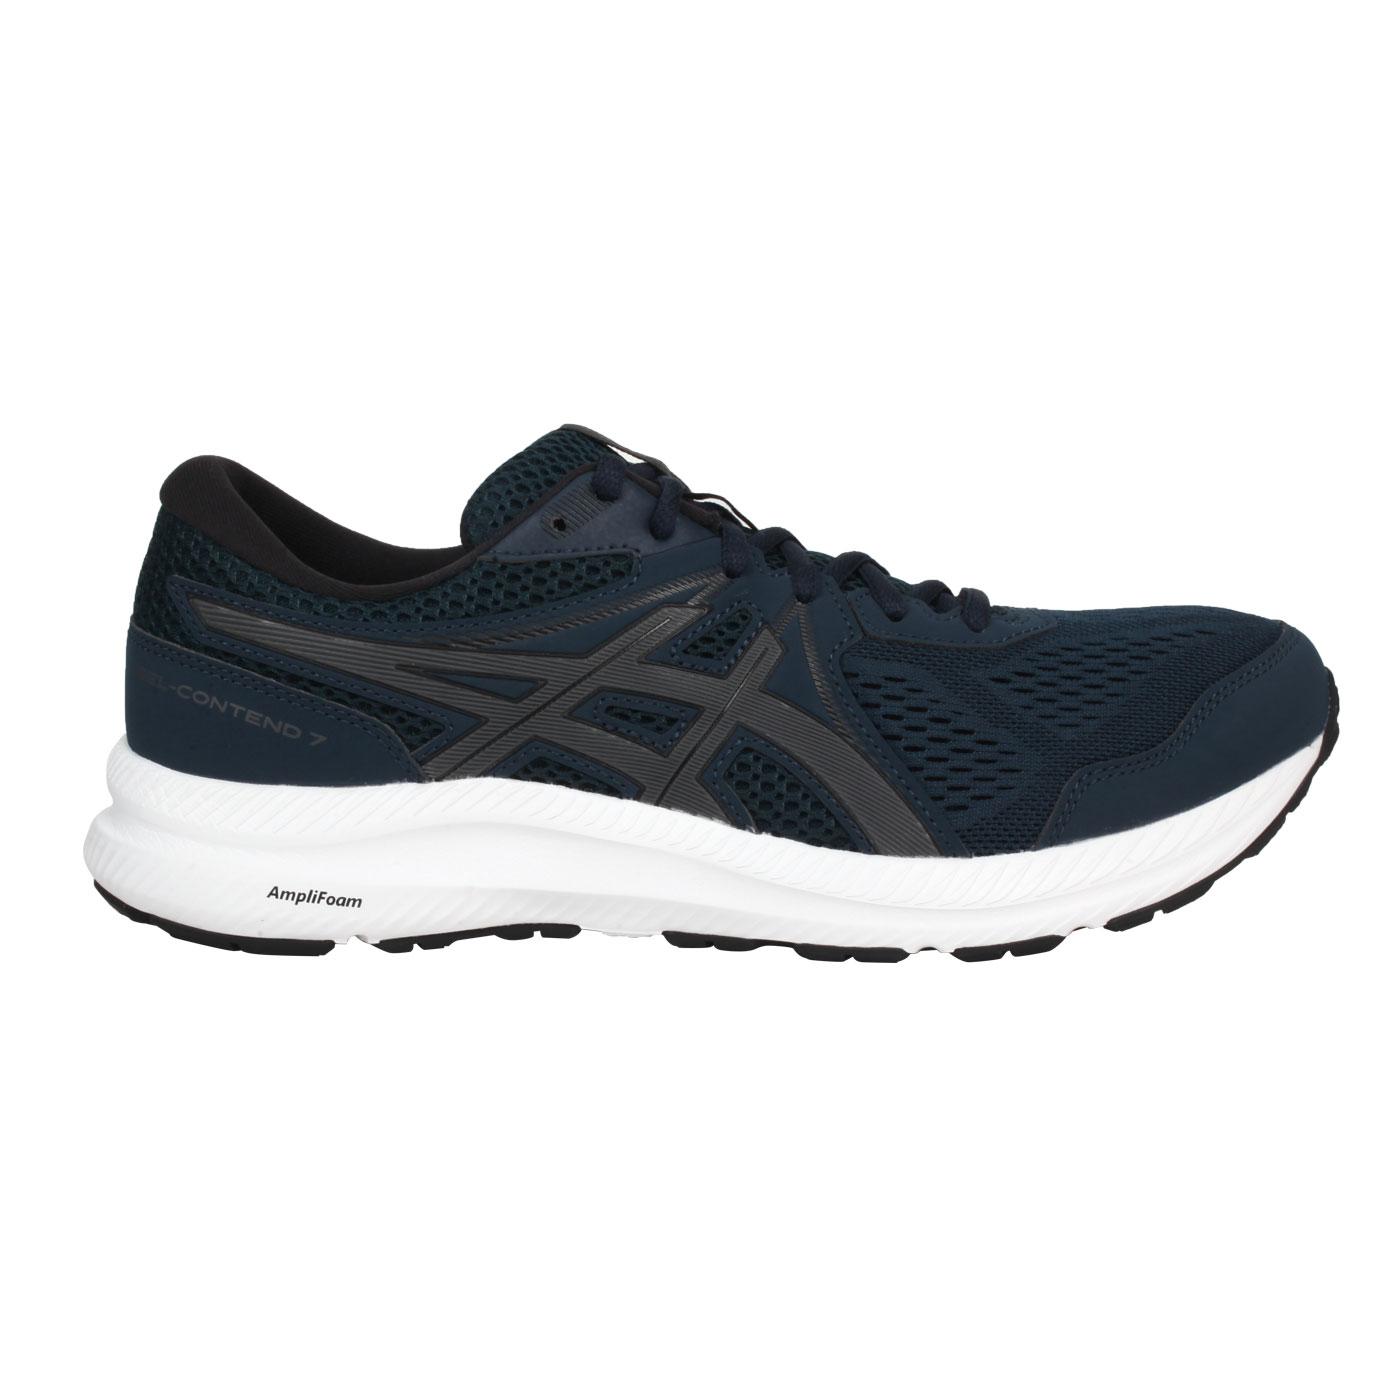 ASICS 男款慢跑鞋  @GEL-CONTEND 7@1011B040-400 - 丈青黑